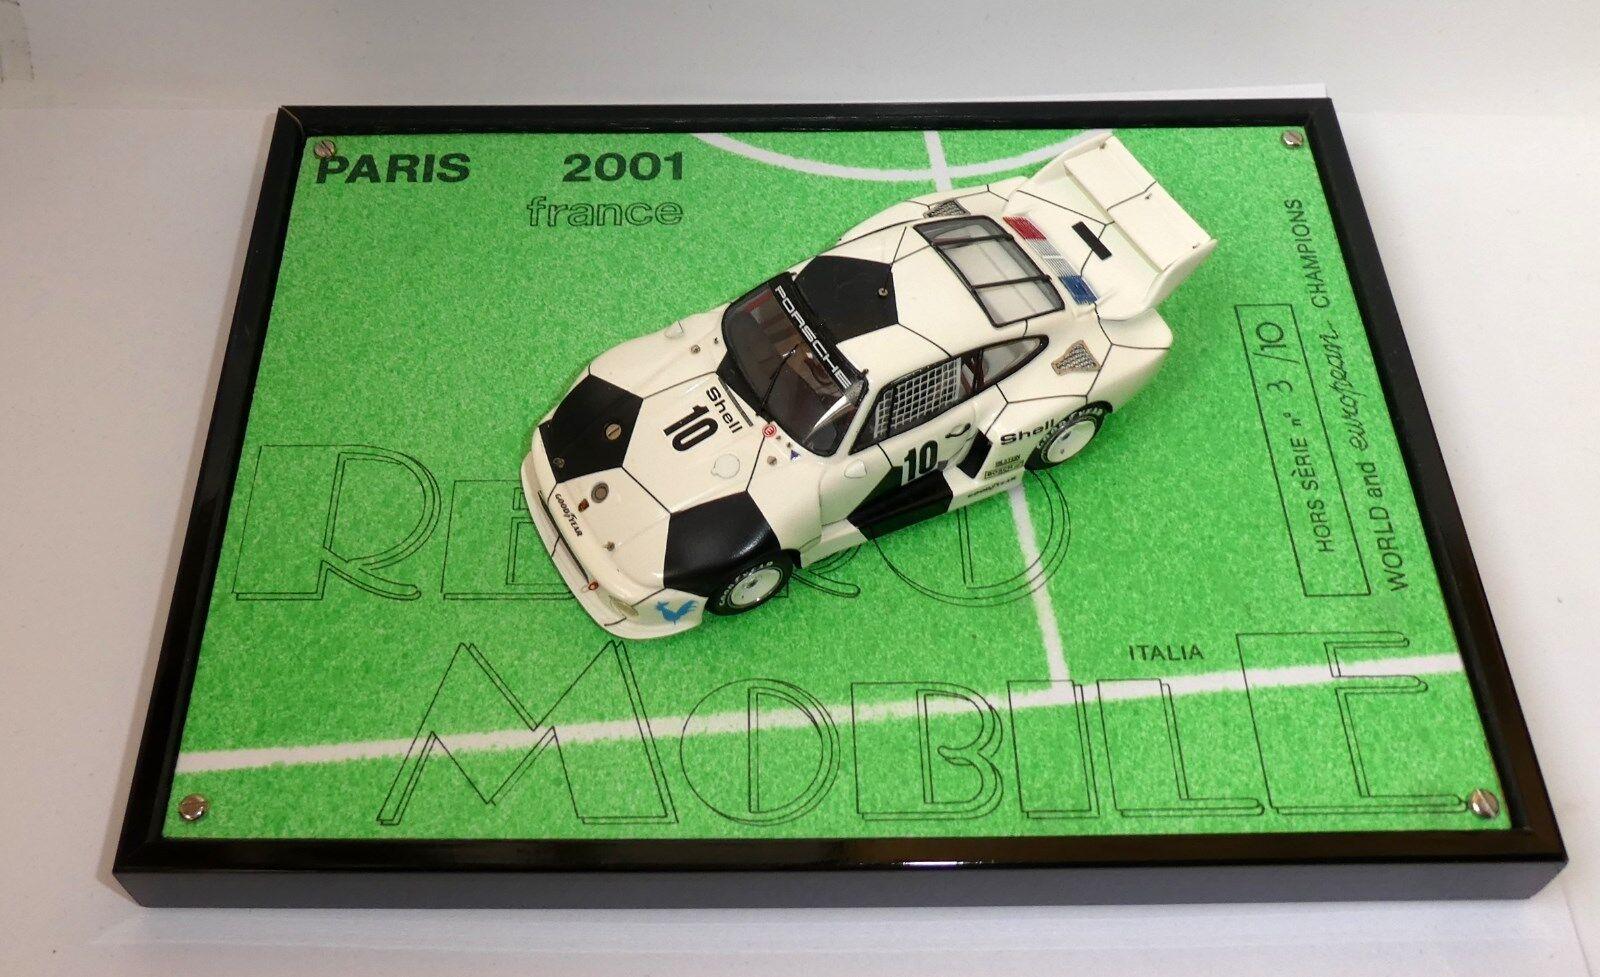 ULTRARARE PORSCHE 935 Fußball-Weltmeister Retromobile 2001 ROBUSTELLI 1:43 03/10